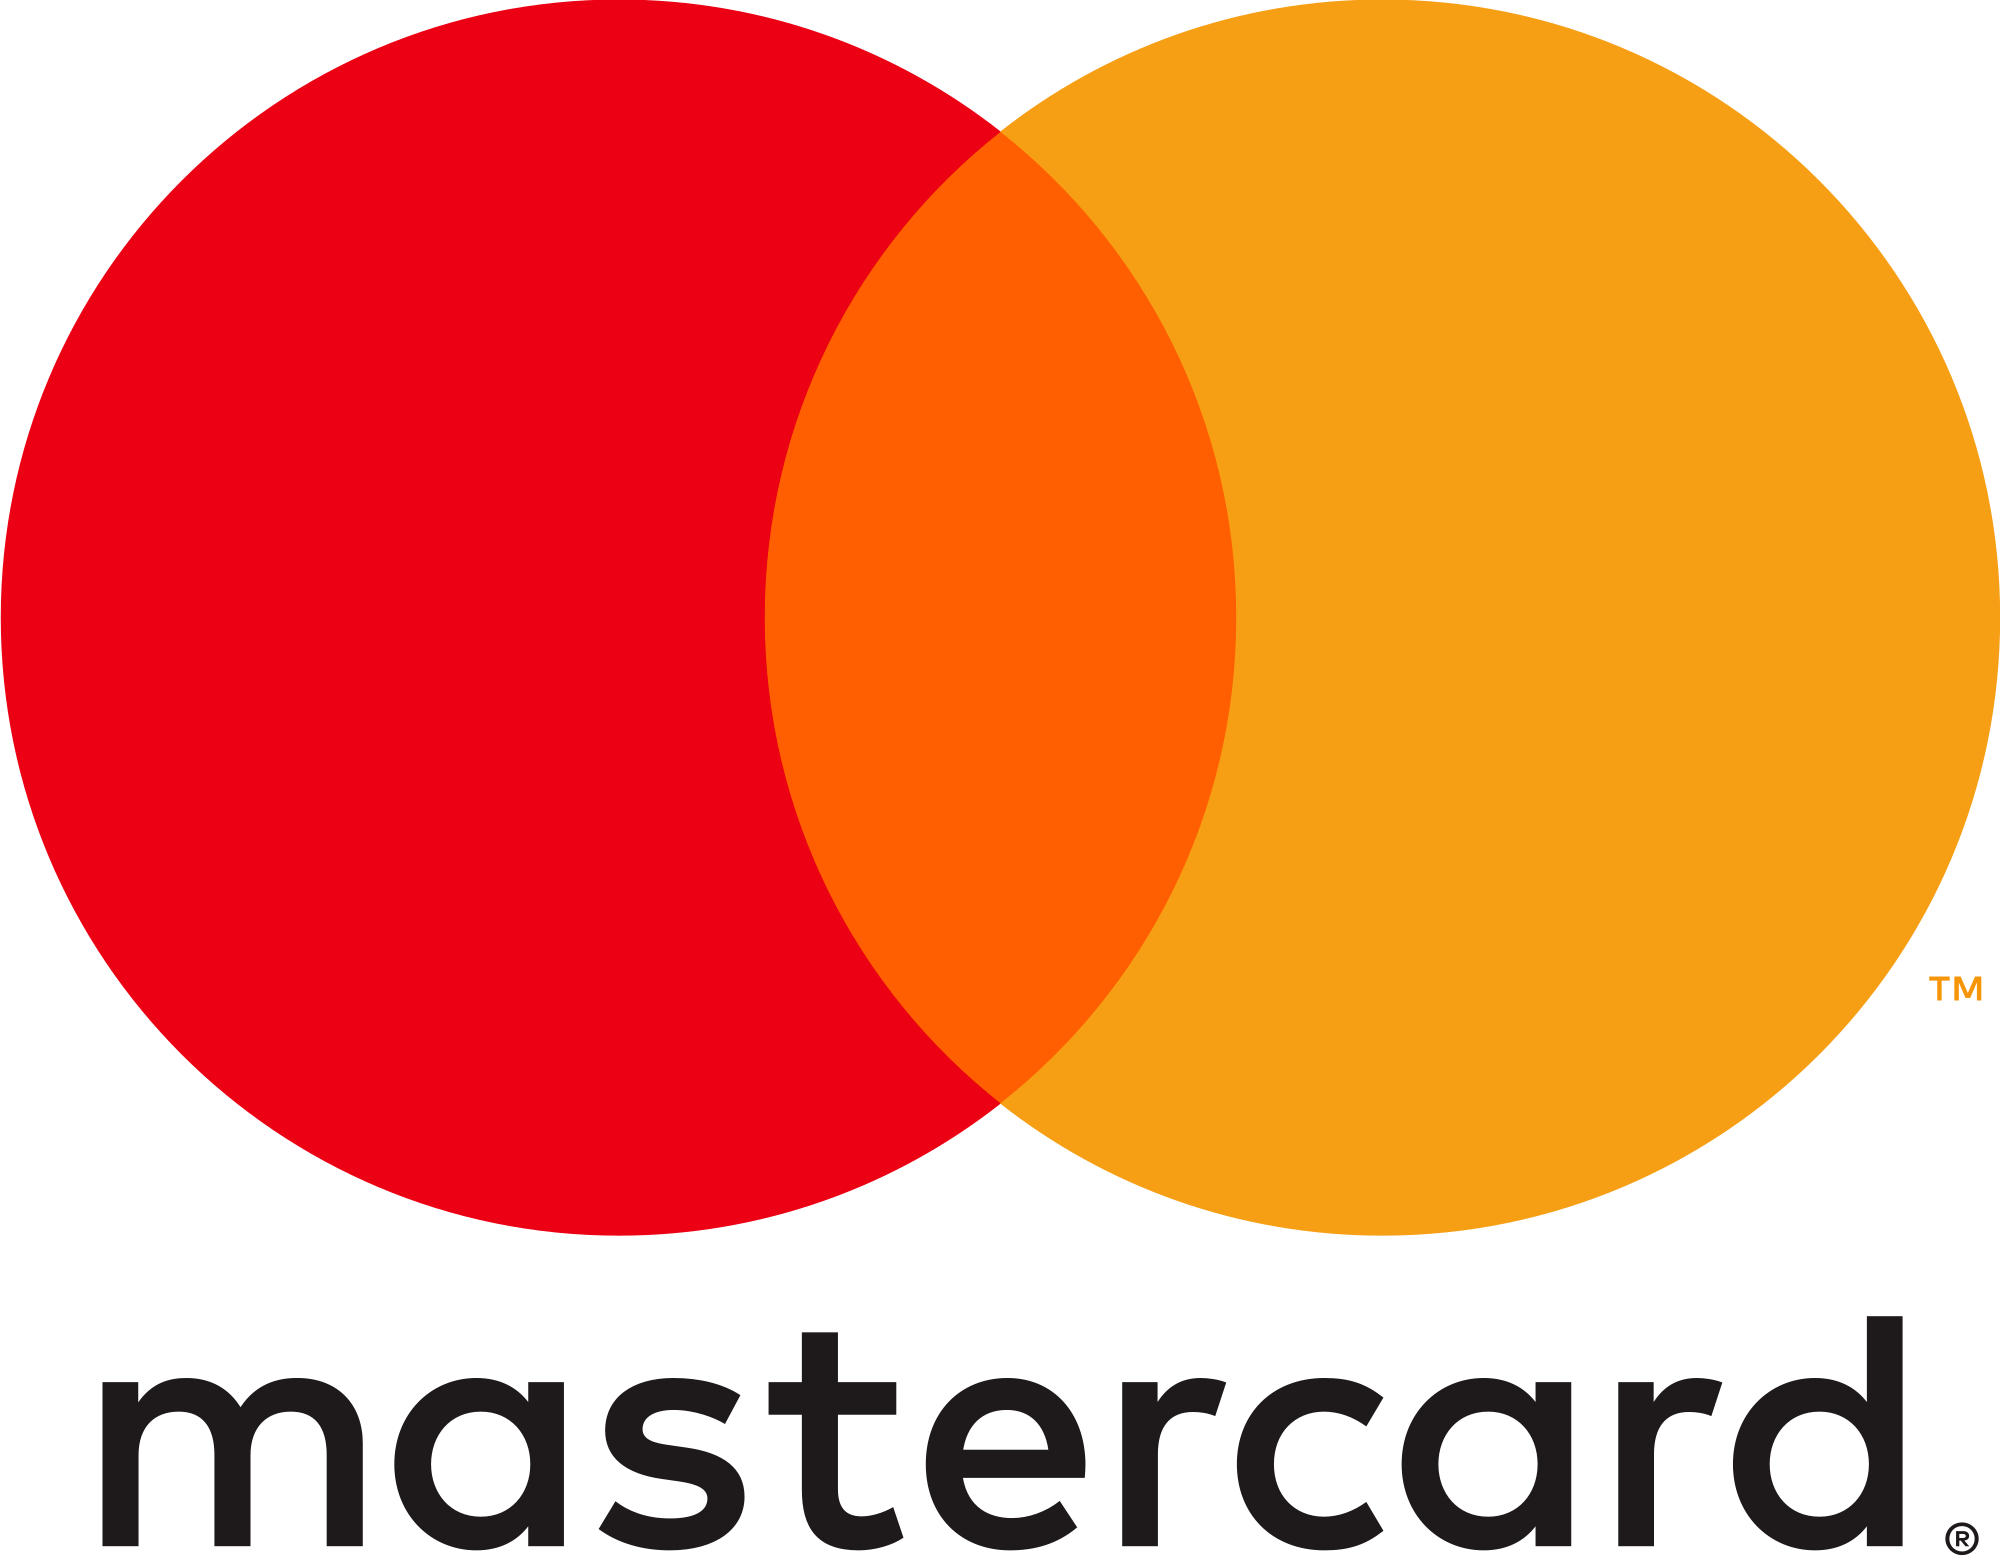 Dan Balistierri, Vice President, Global Service & Experience, MasterCard